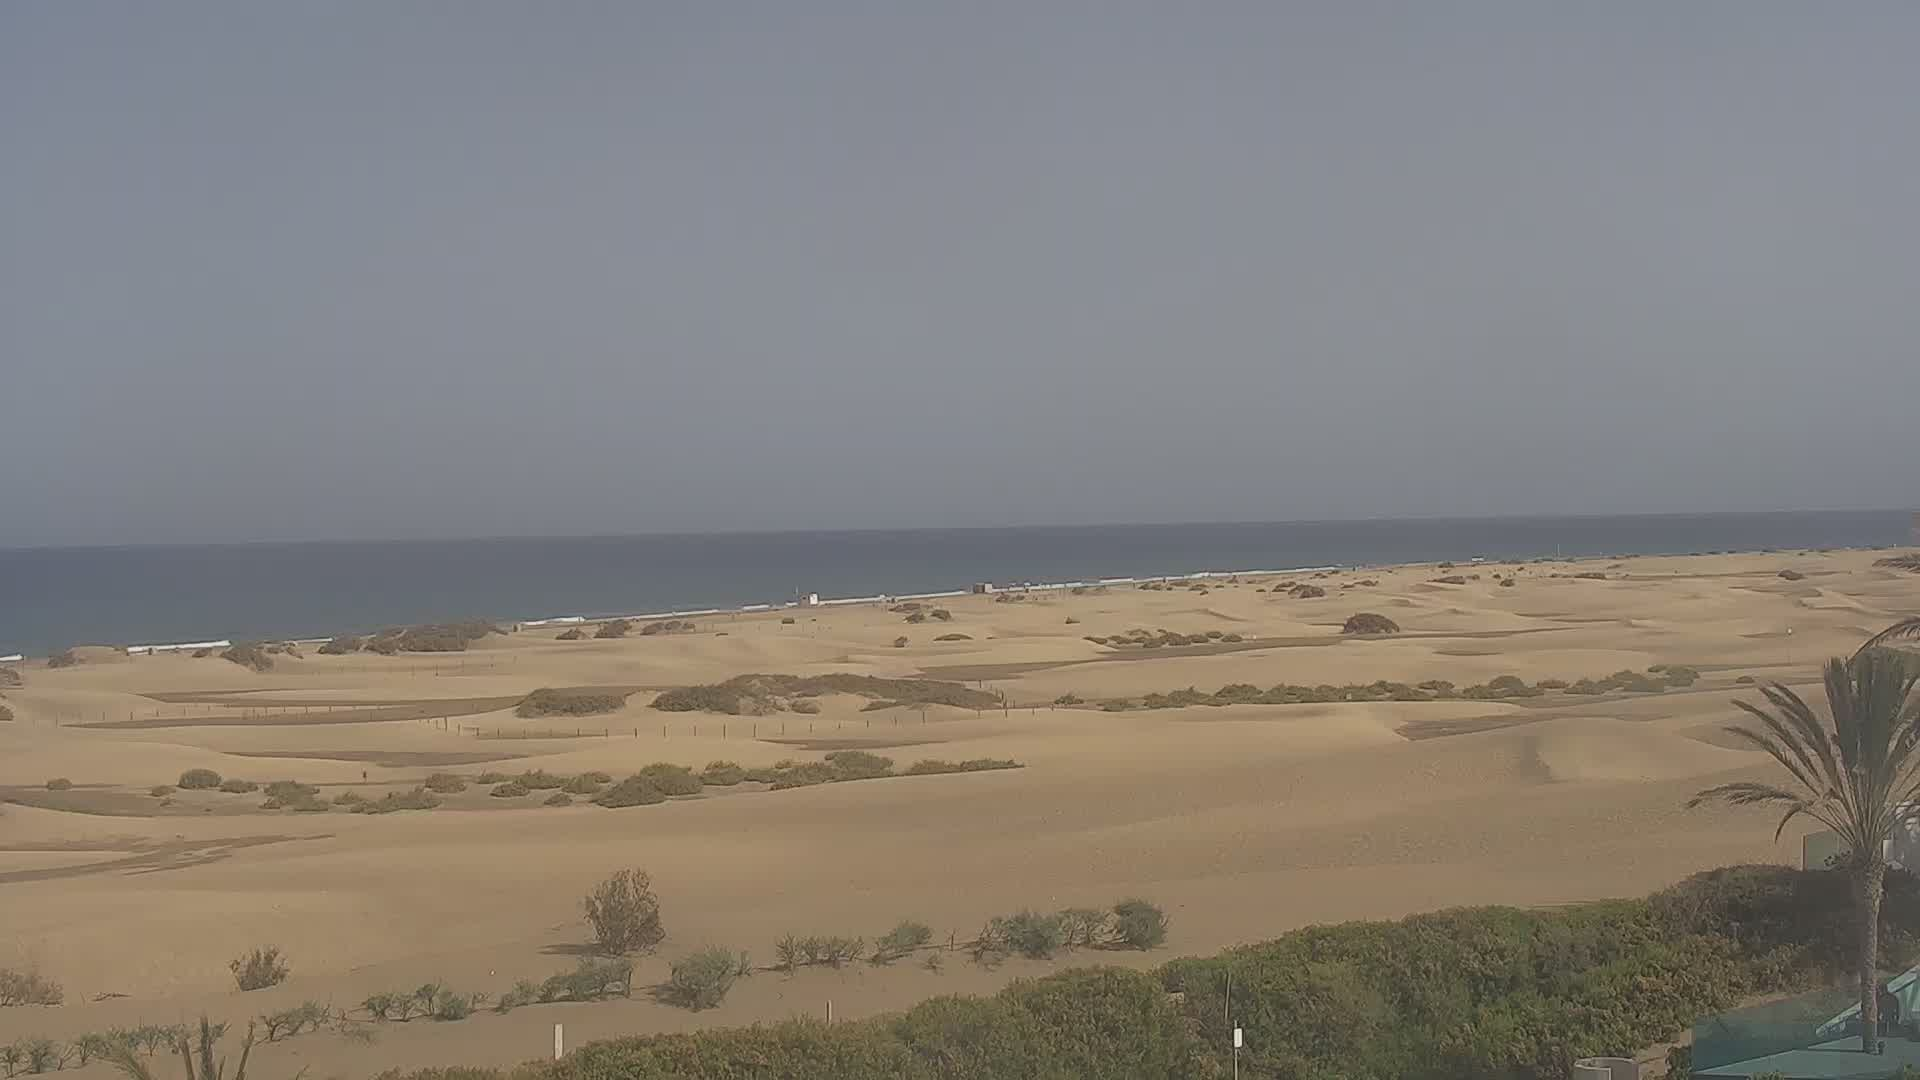 Playa del Ingles (Gran Canaria) Sat. 17:36